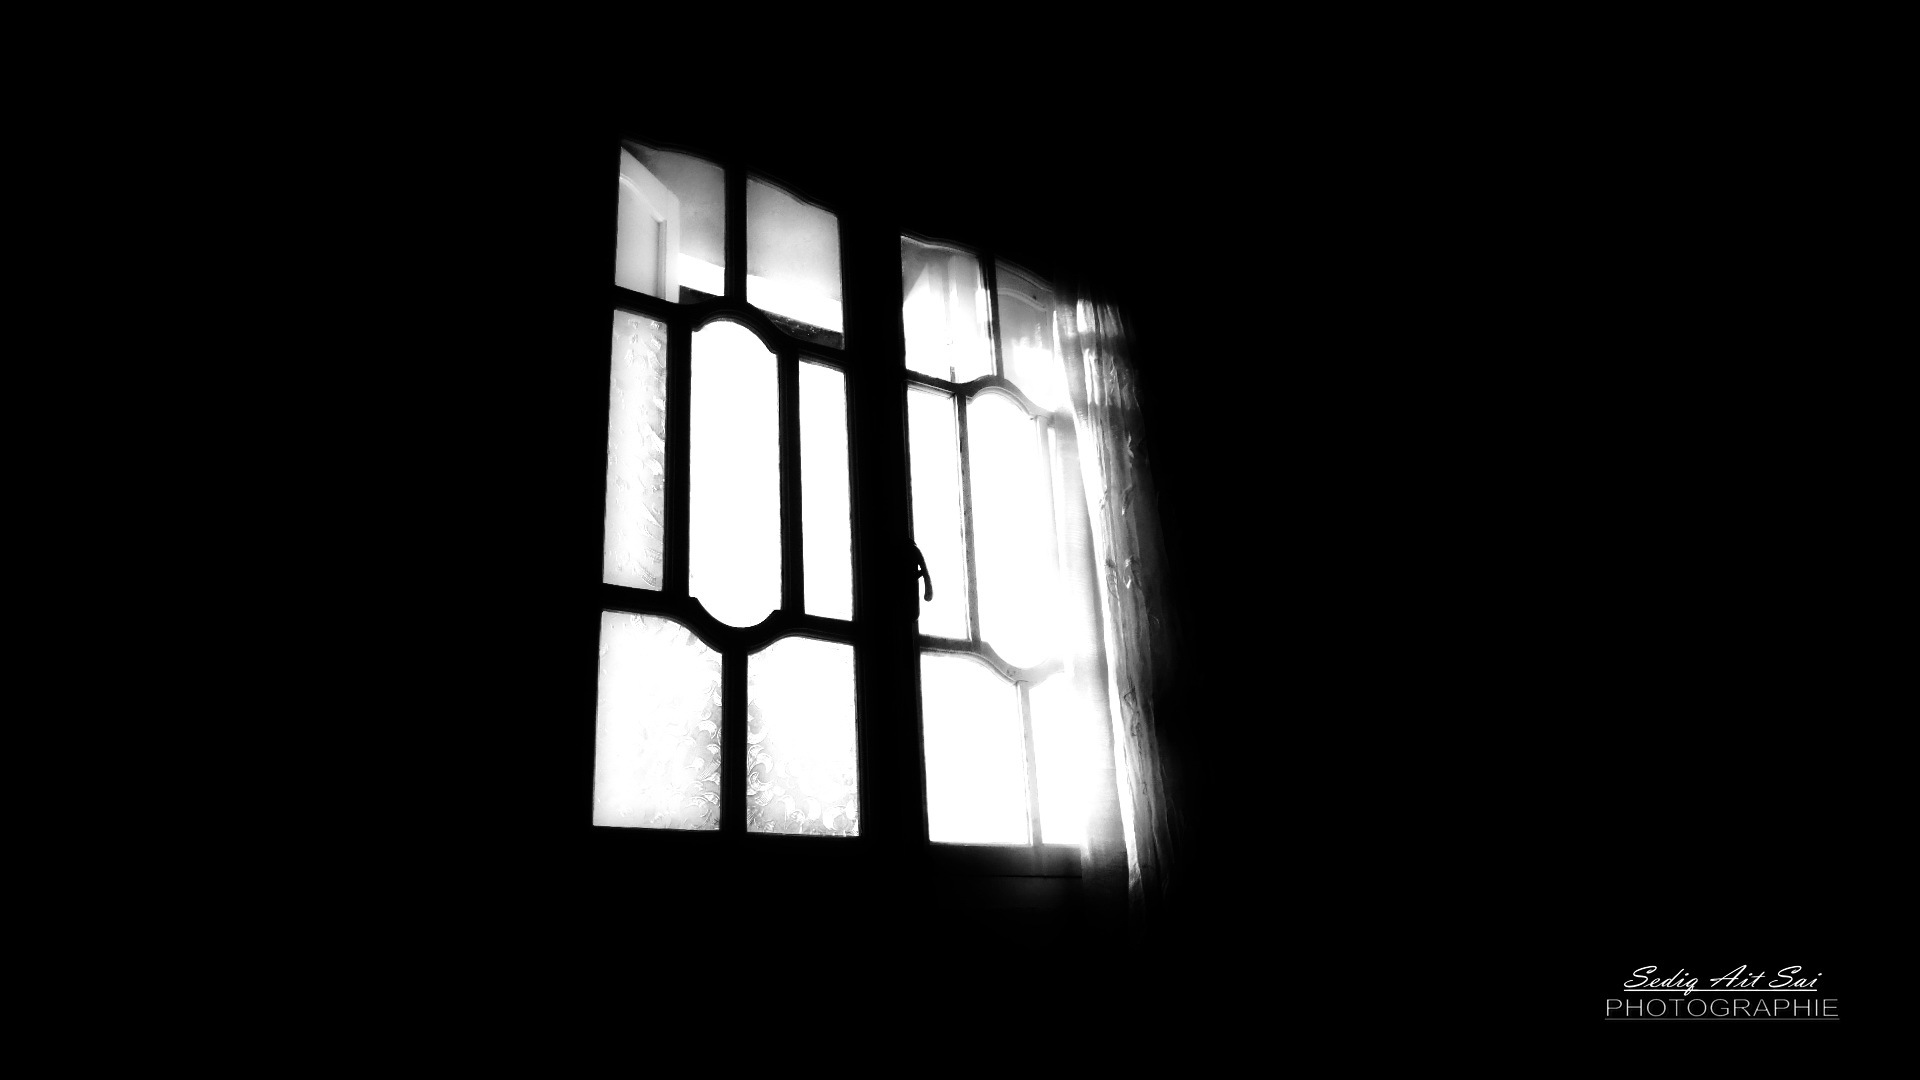 Windows by Seddik Ait Sai